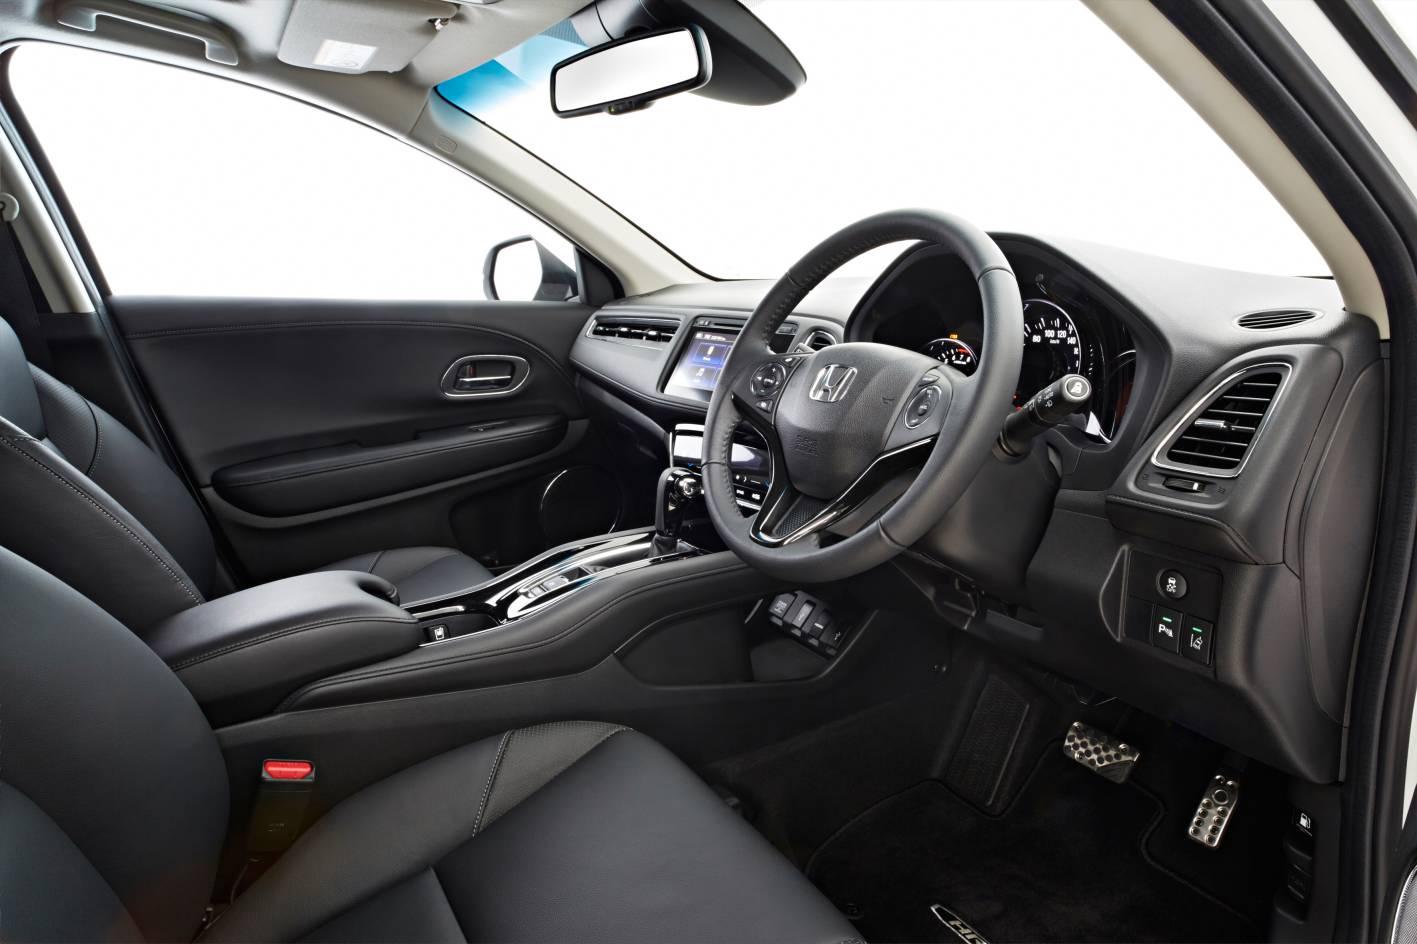 Honda hr v review 2015 honda hr v for Honda hr v interieur